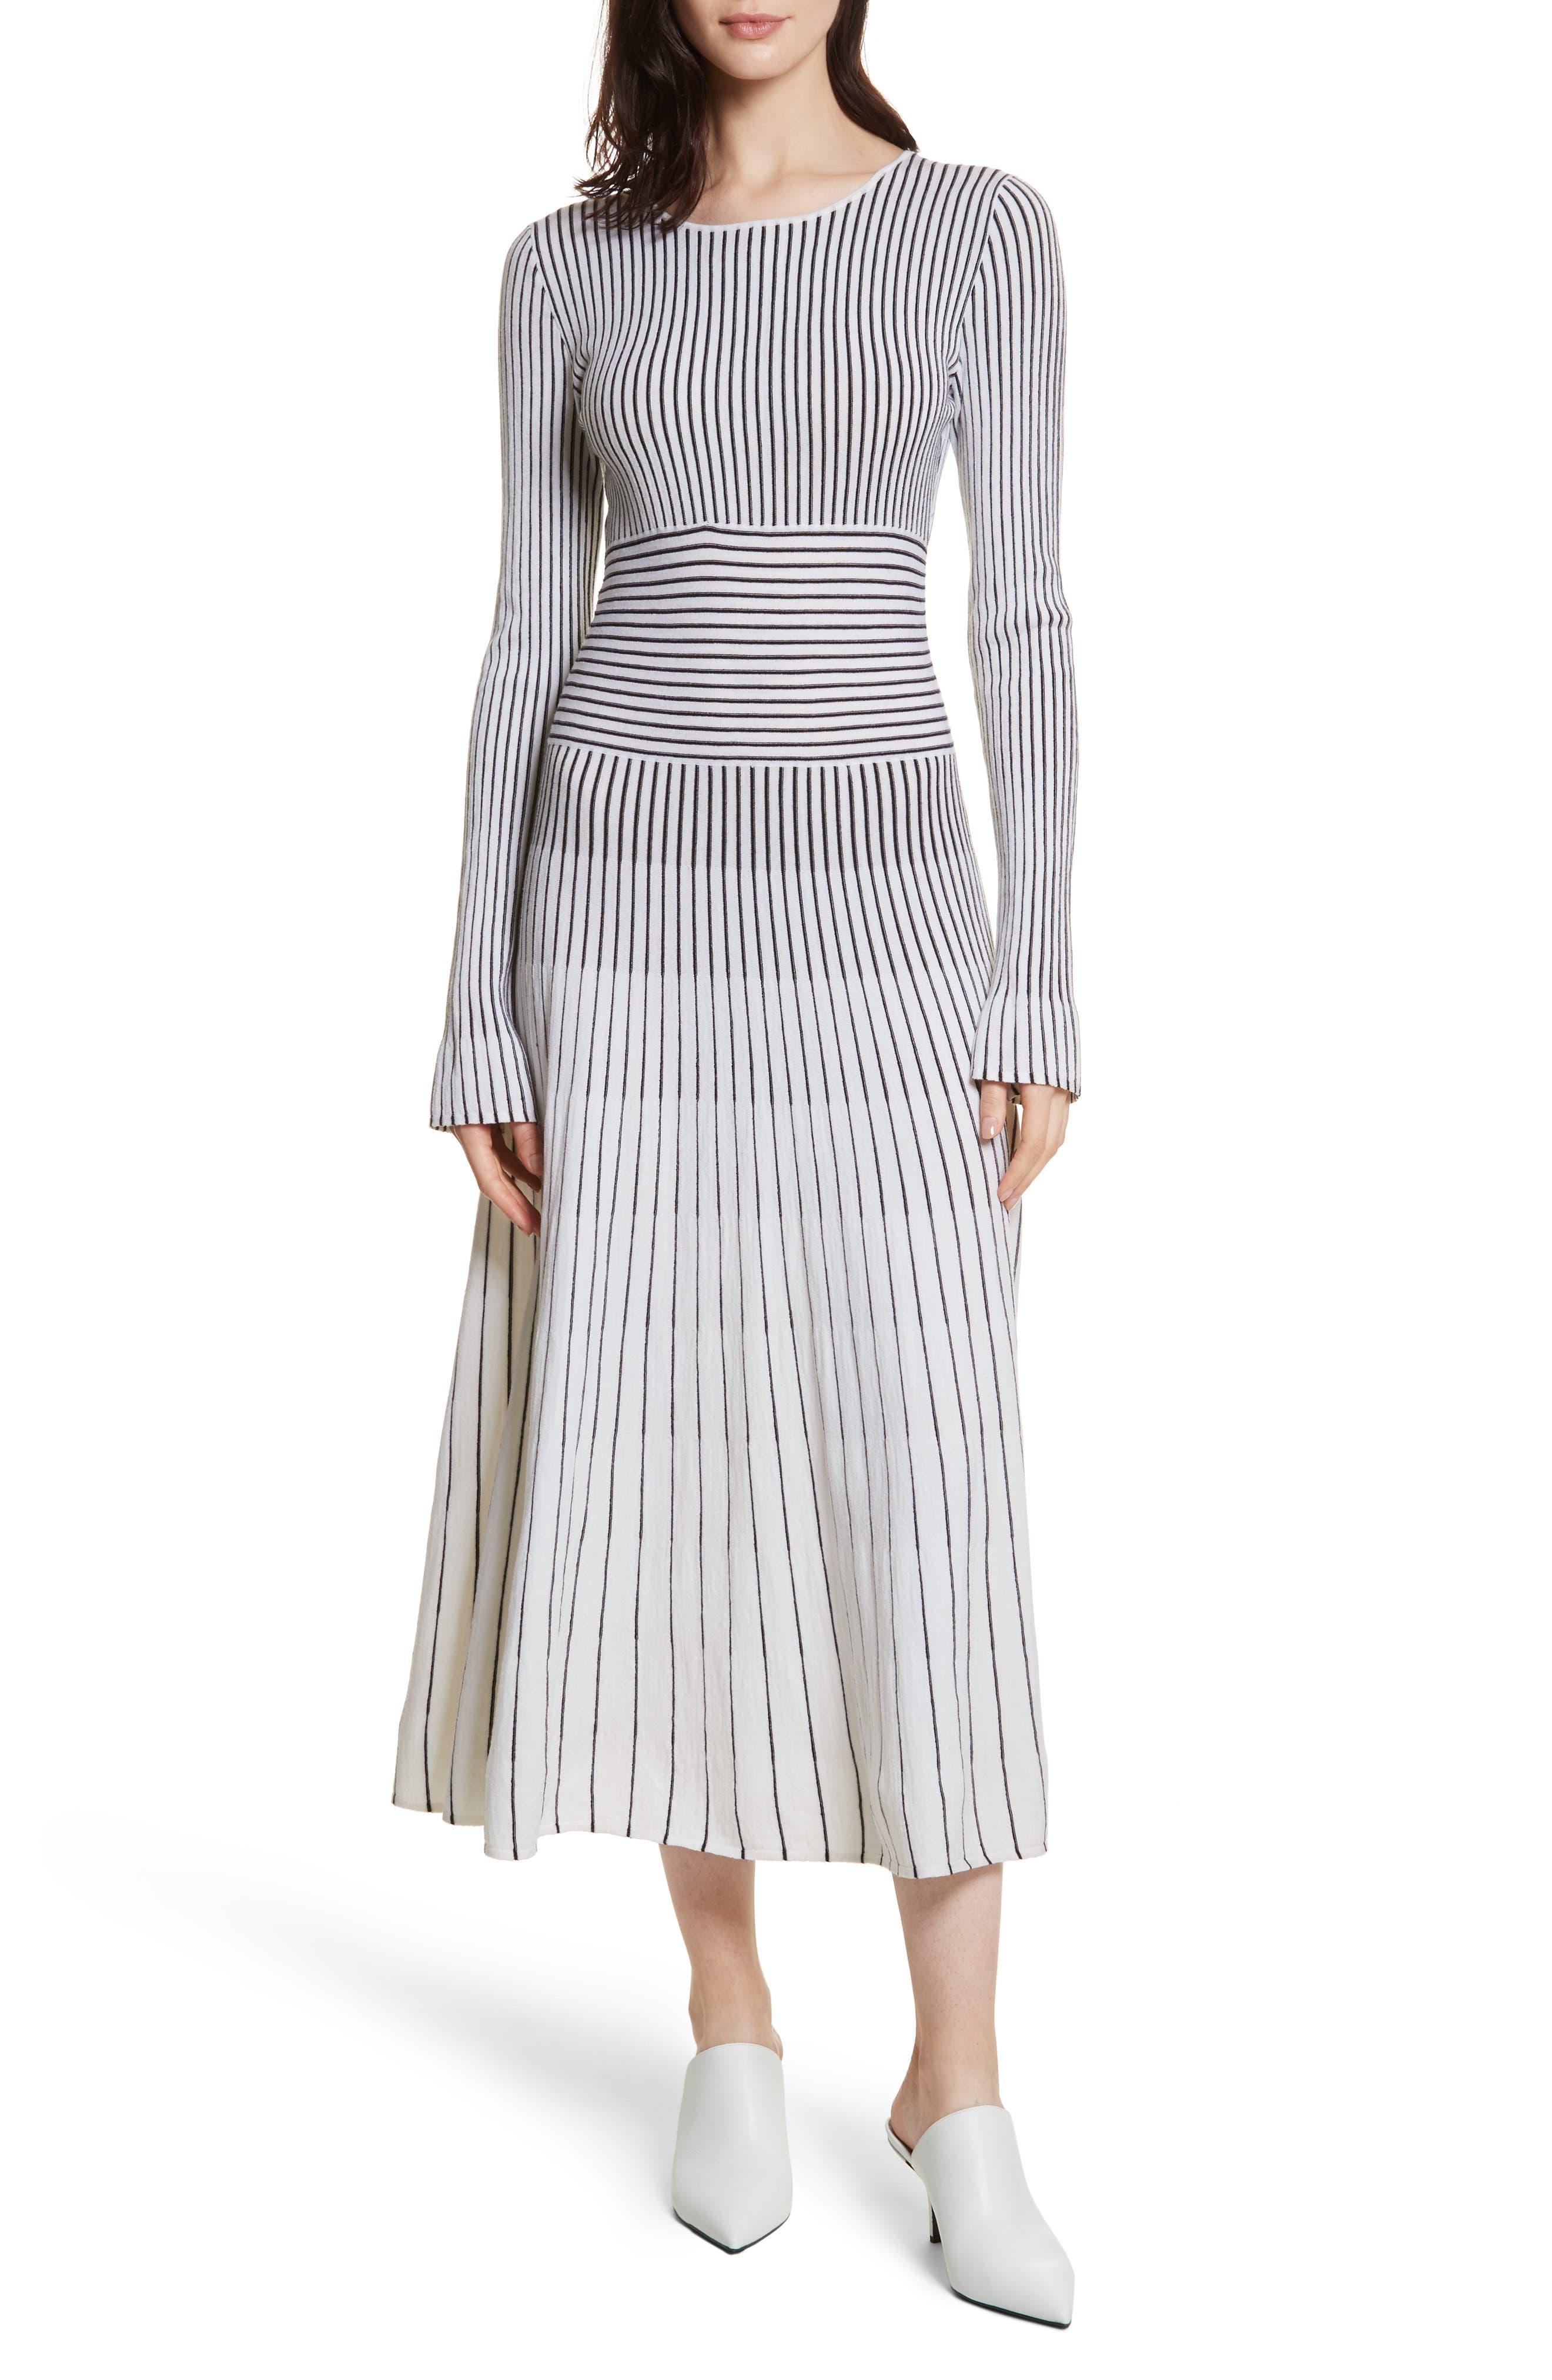 Main Image - Elizabeth and James Sheridan Stripe Knit Midi Dress